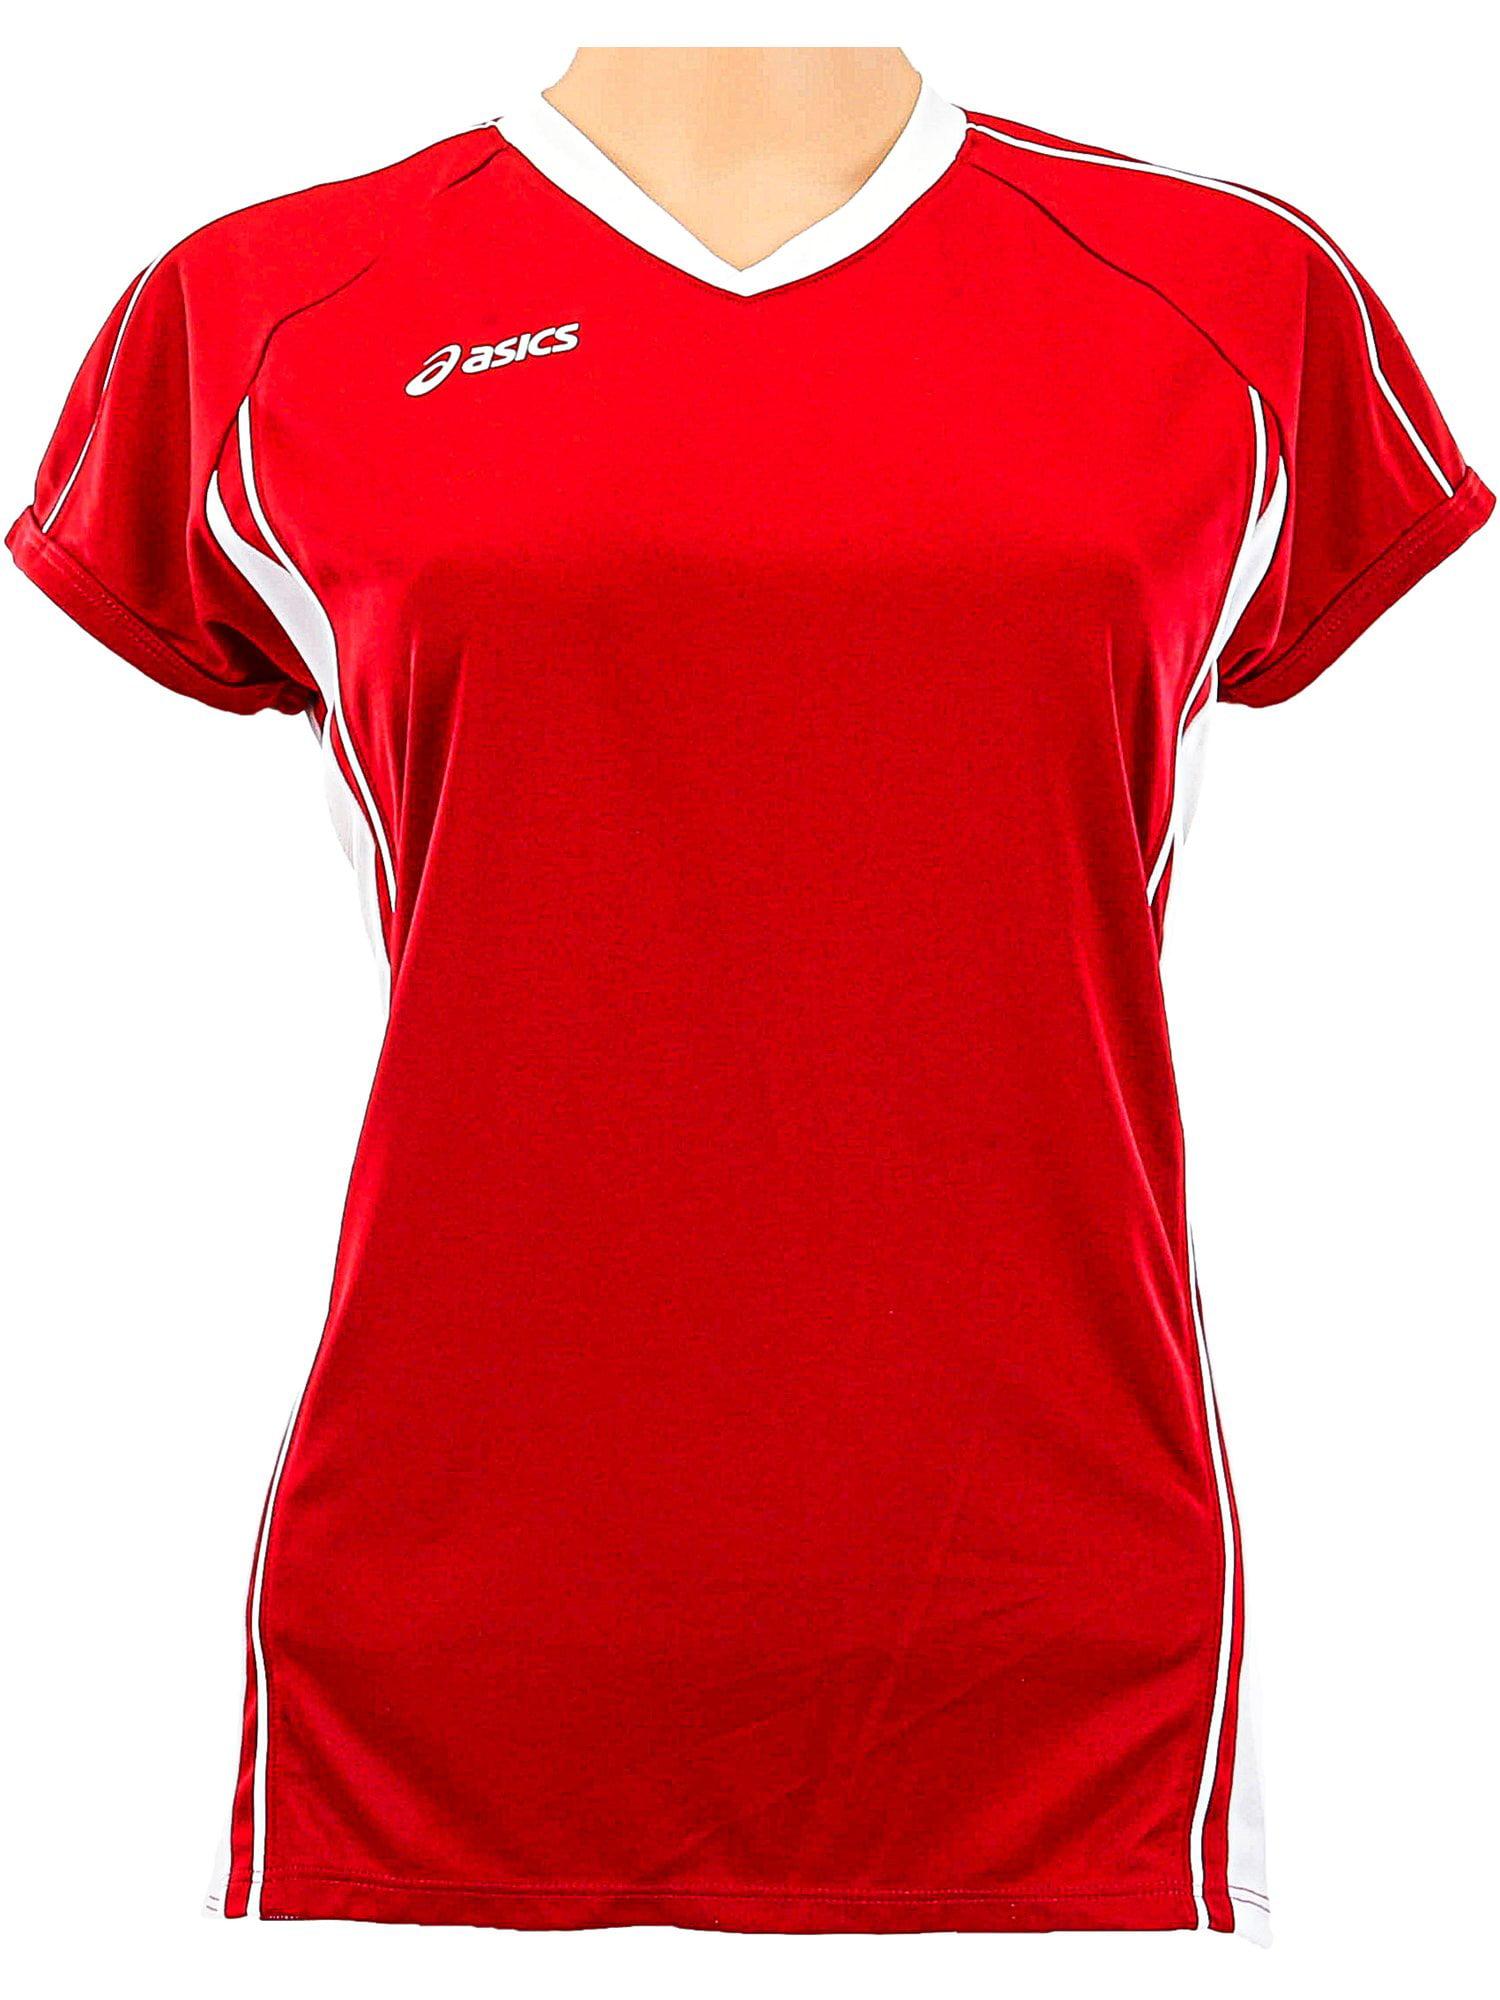 4c94c850 Sports Jerseys for Sale in Canada   Walmart Canada